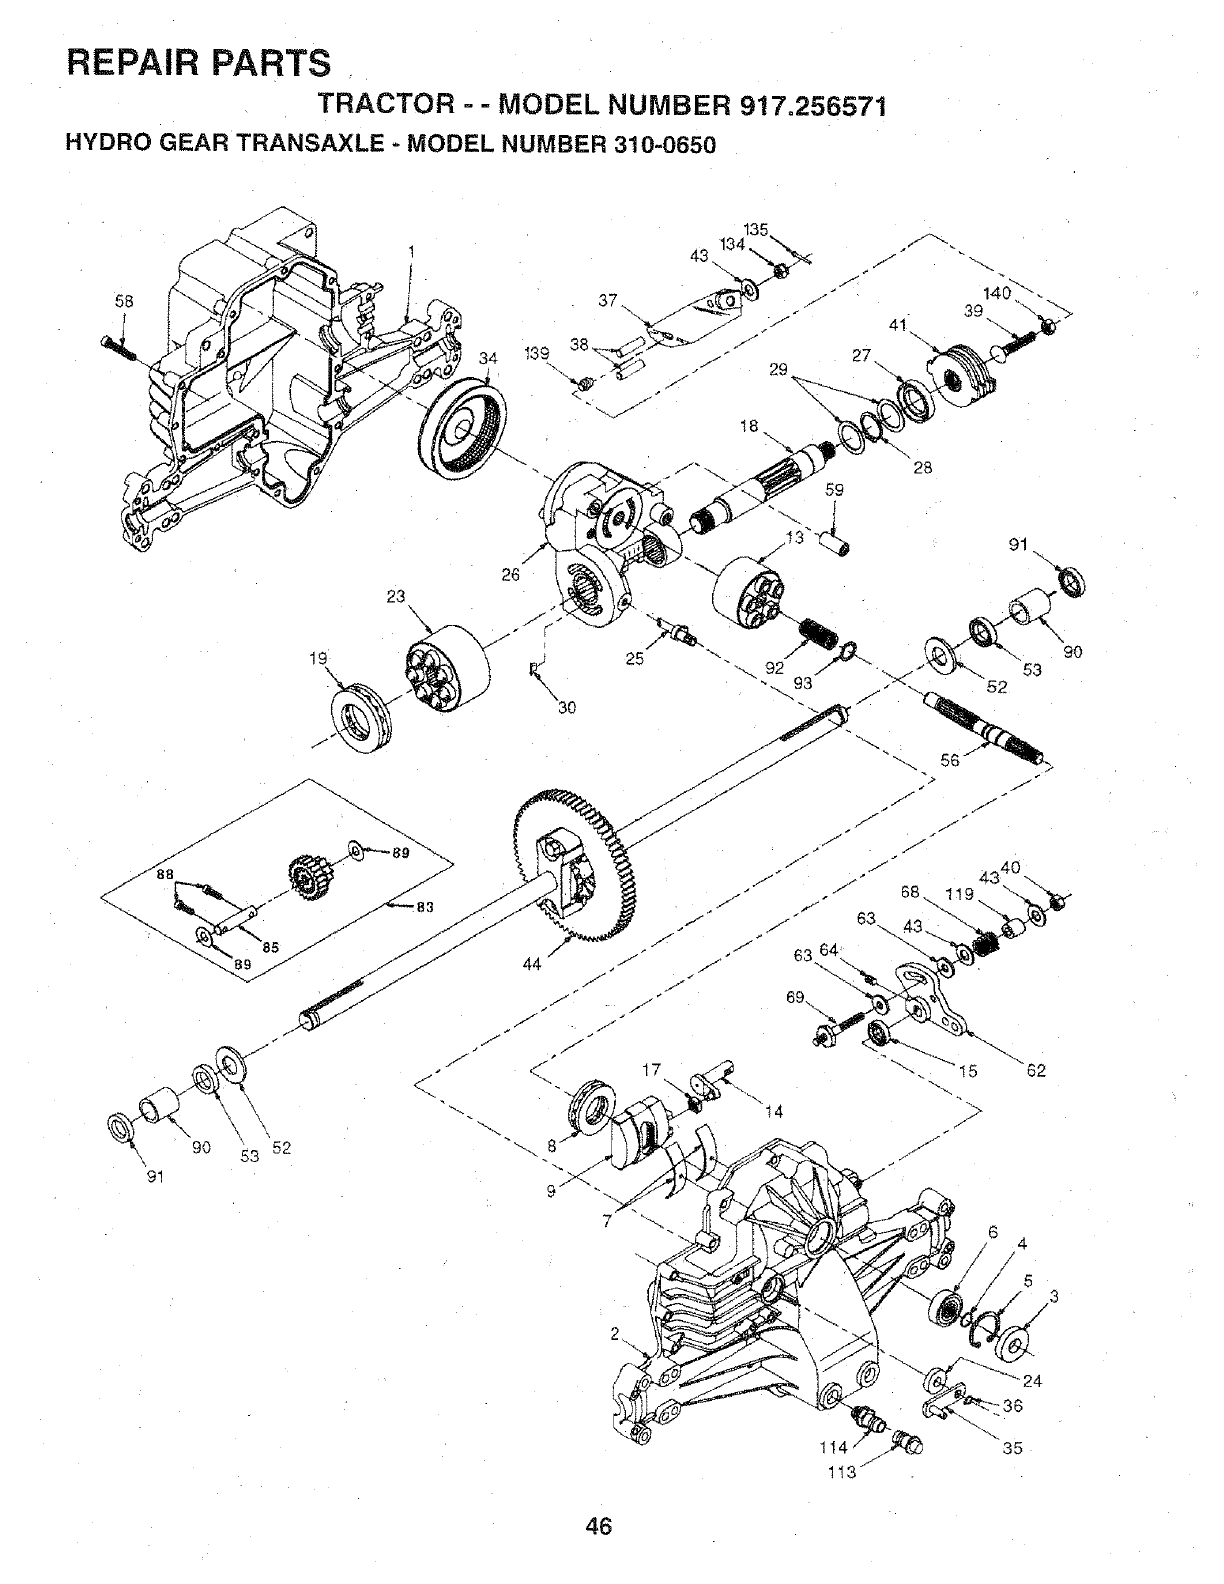 Craftsman 917256571 User Manual Tractor Manuals And Guides L0711532 134 Engine Exhaust Valve Diagram Repair Parts